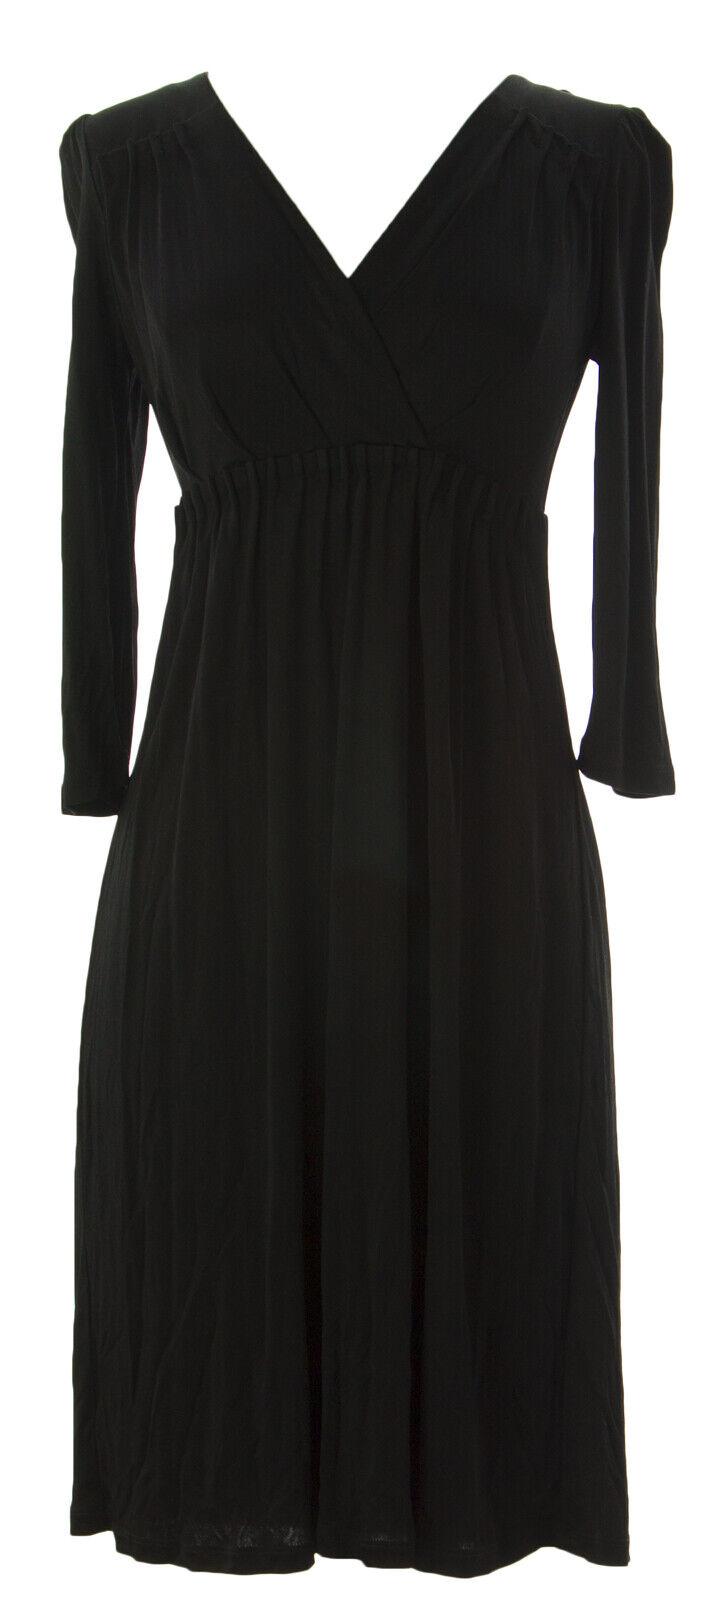 BODEN Woherren schwarz Empire Waist Grace Dress WH418 US Sz 2R  NWOT